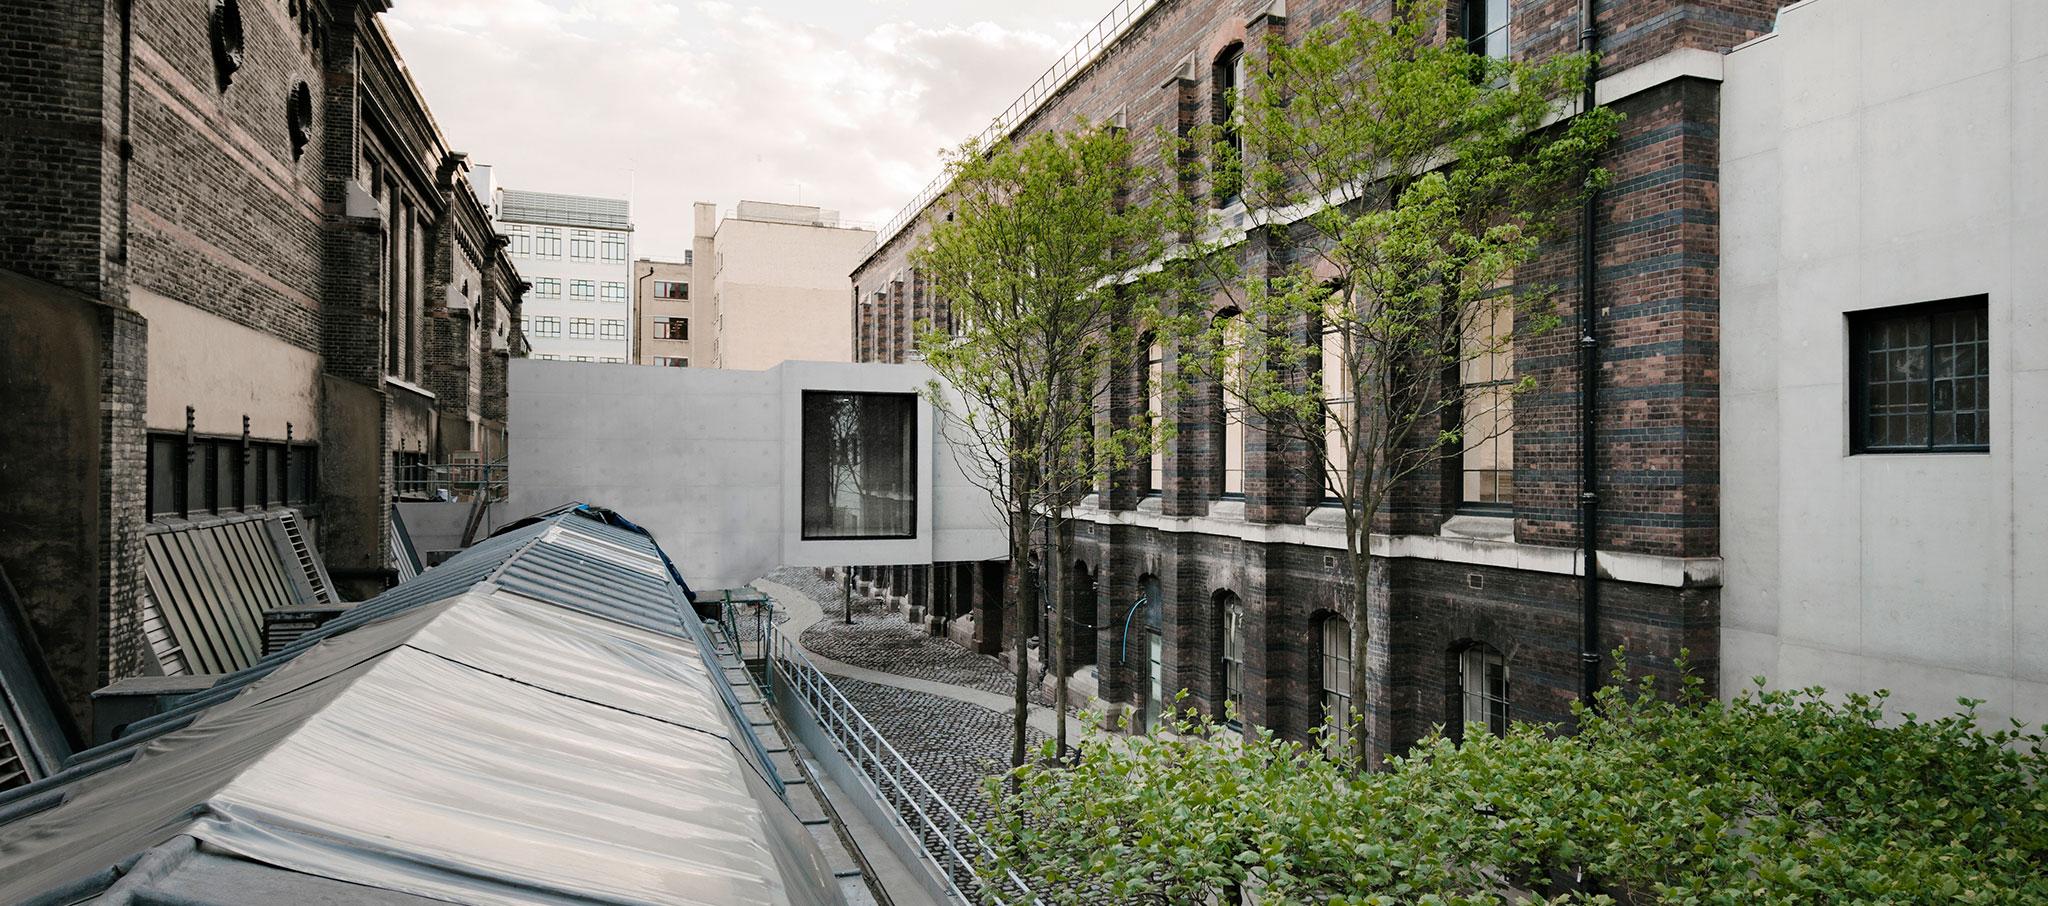 Royal Academy of Arts por David Chipperfield. Fotografía por Simon Menges